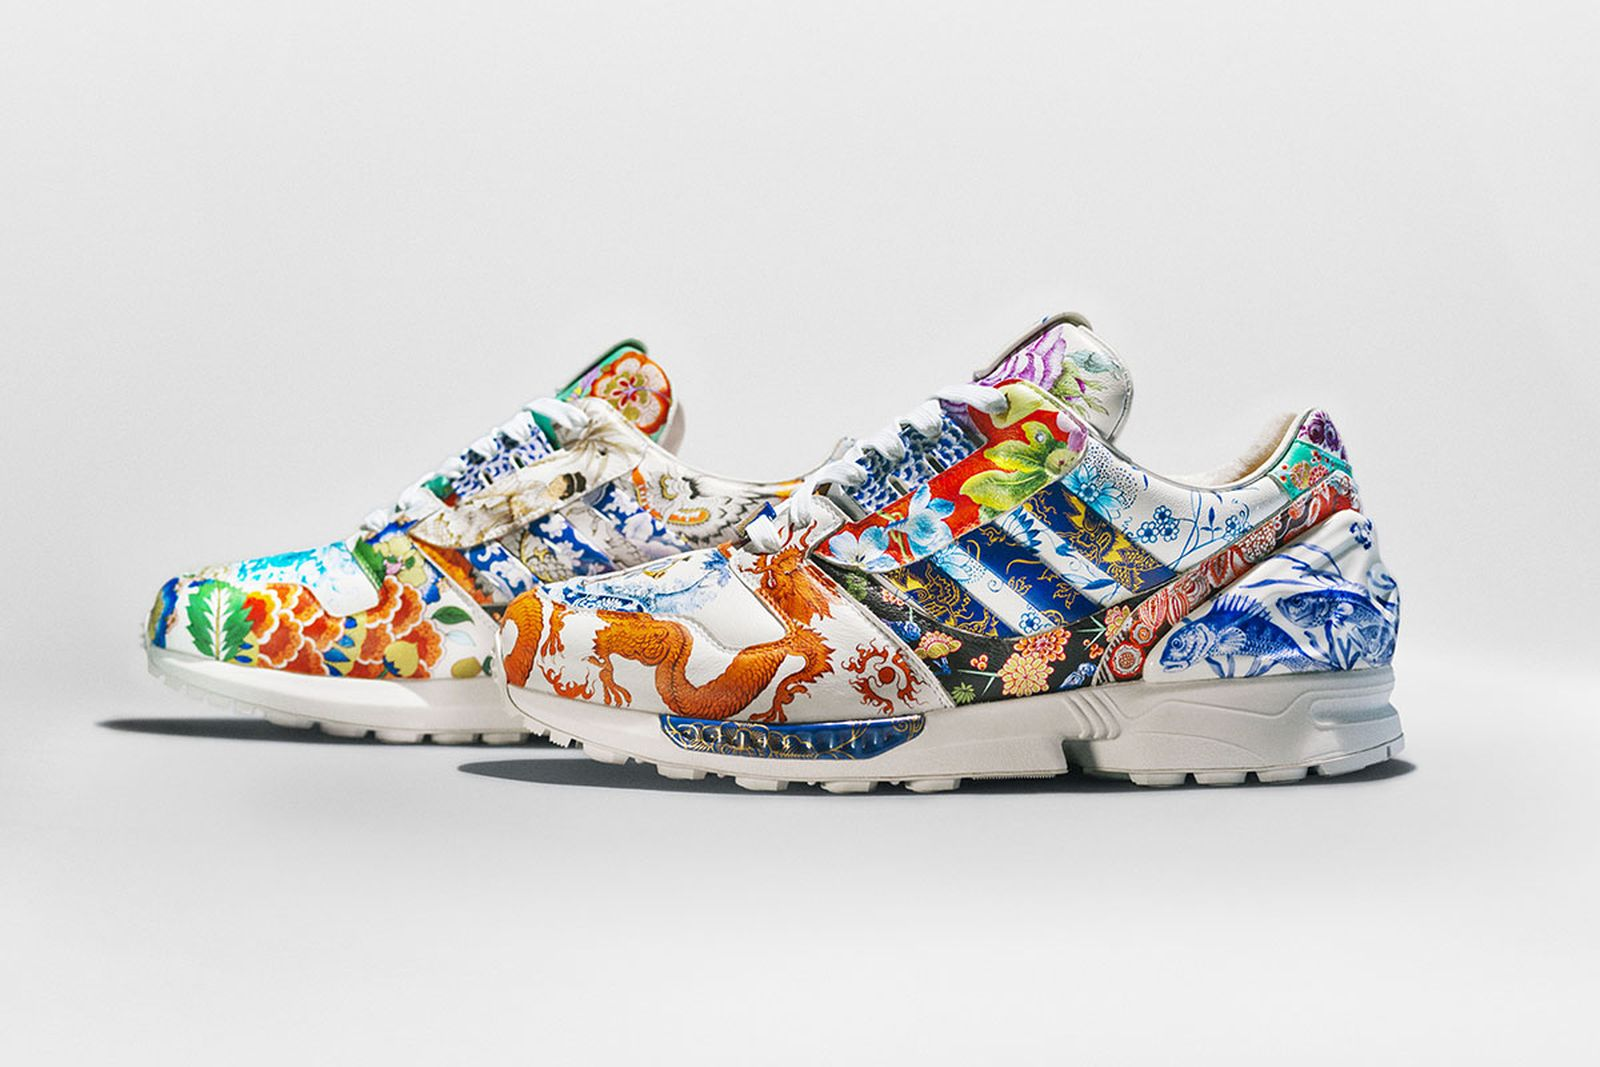 meissen-adidas-zx8000-porcelain-auctioning-sothebys-02